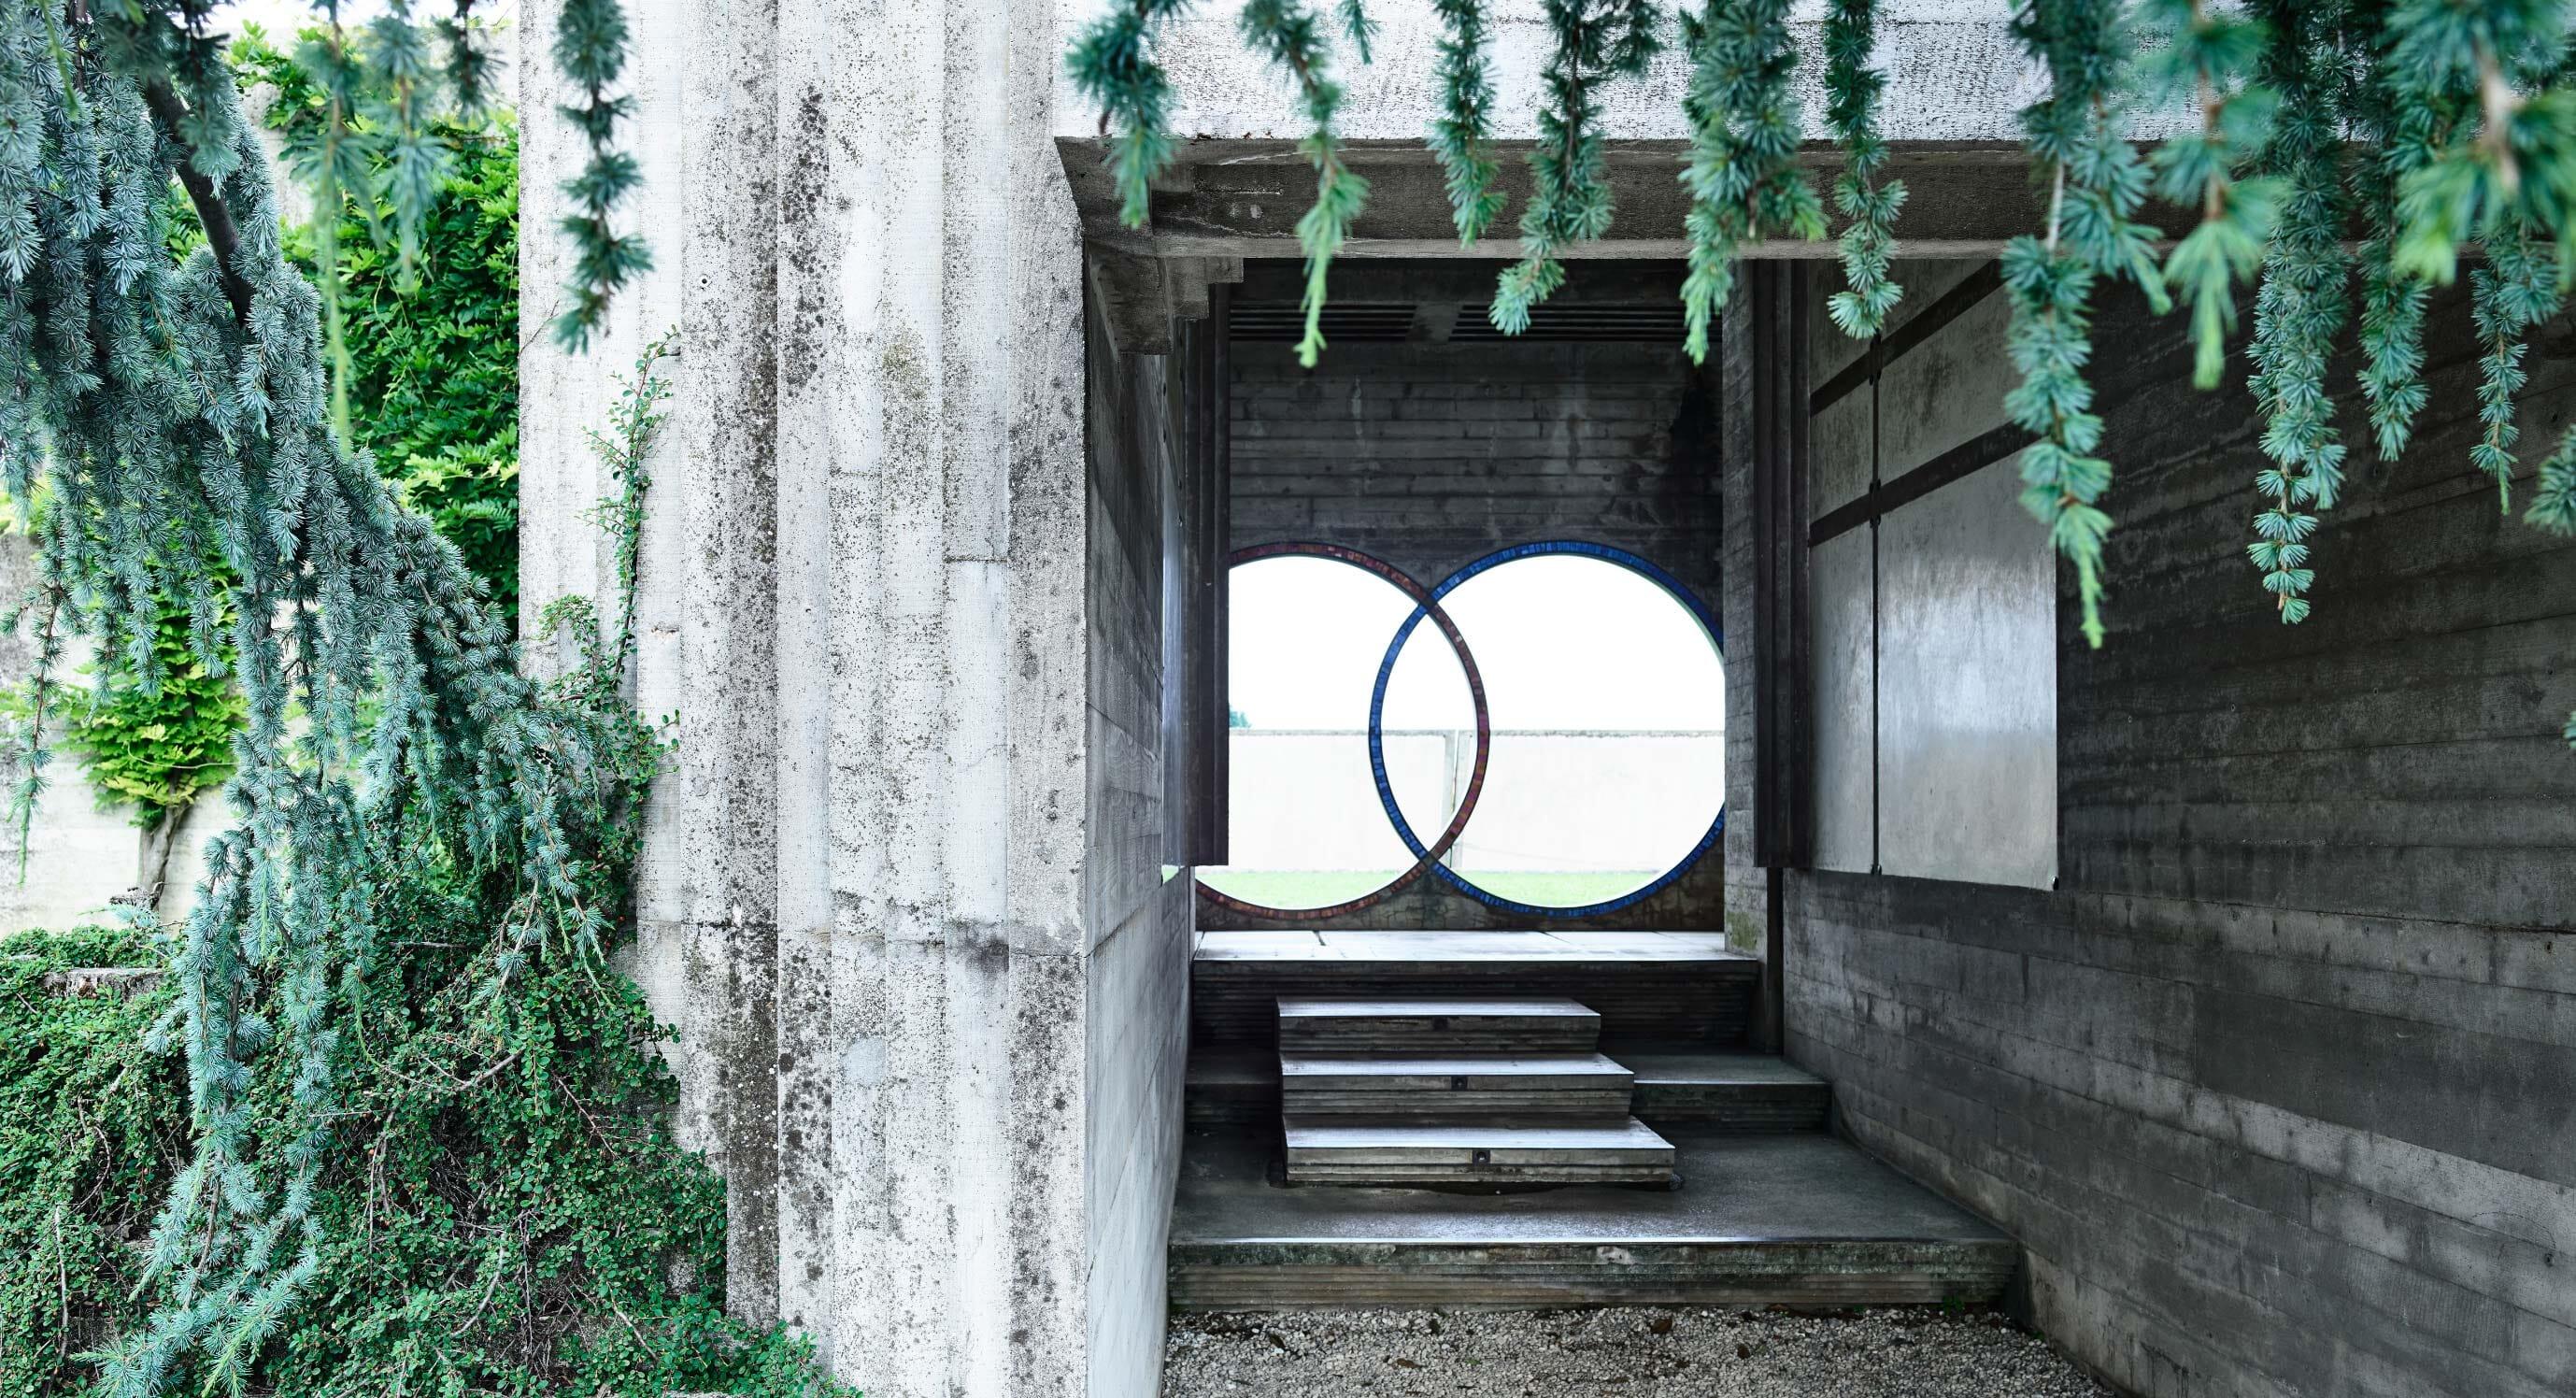 Outdistance: Derek Swalwell's Investigation Into Italian Brutalism